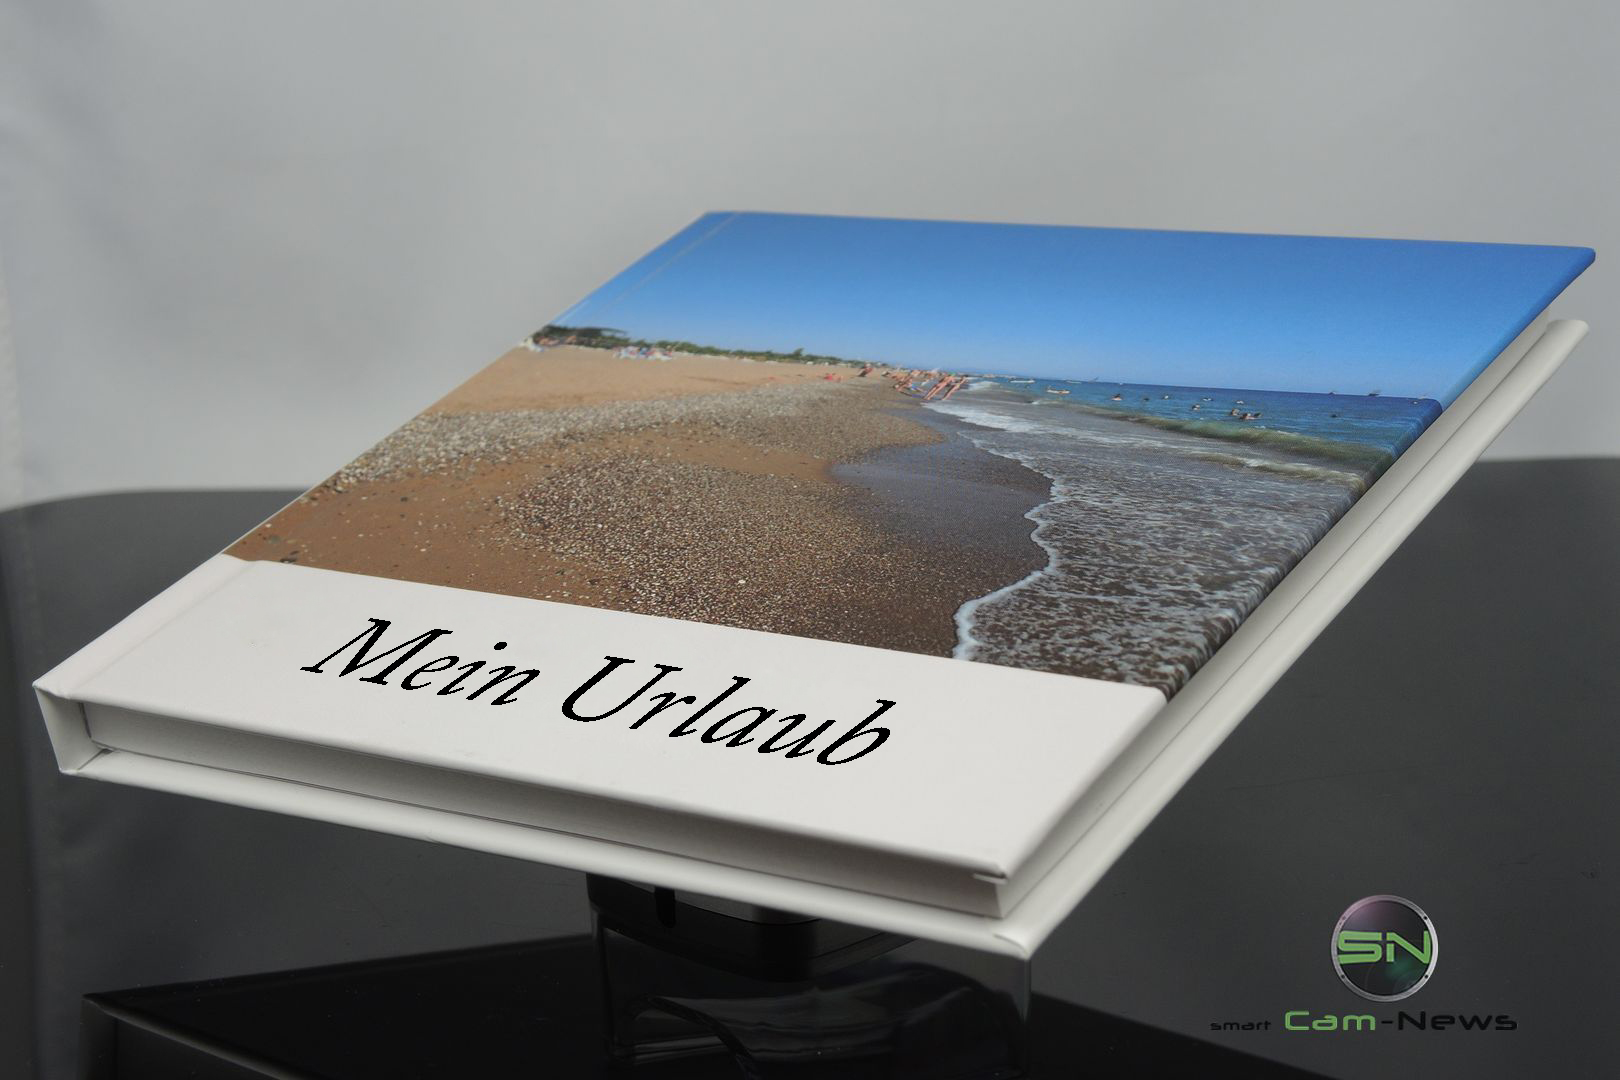 Fotobuch Story Album Samsung App